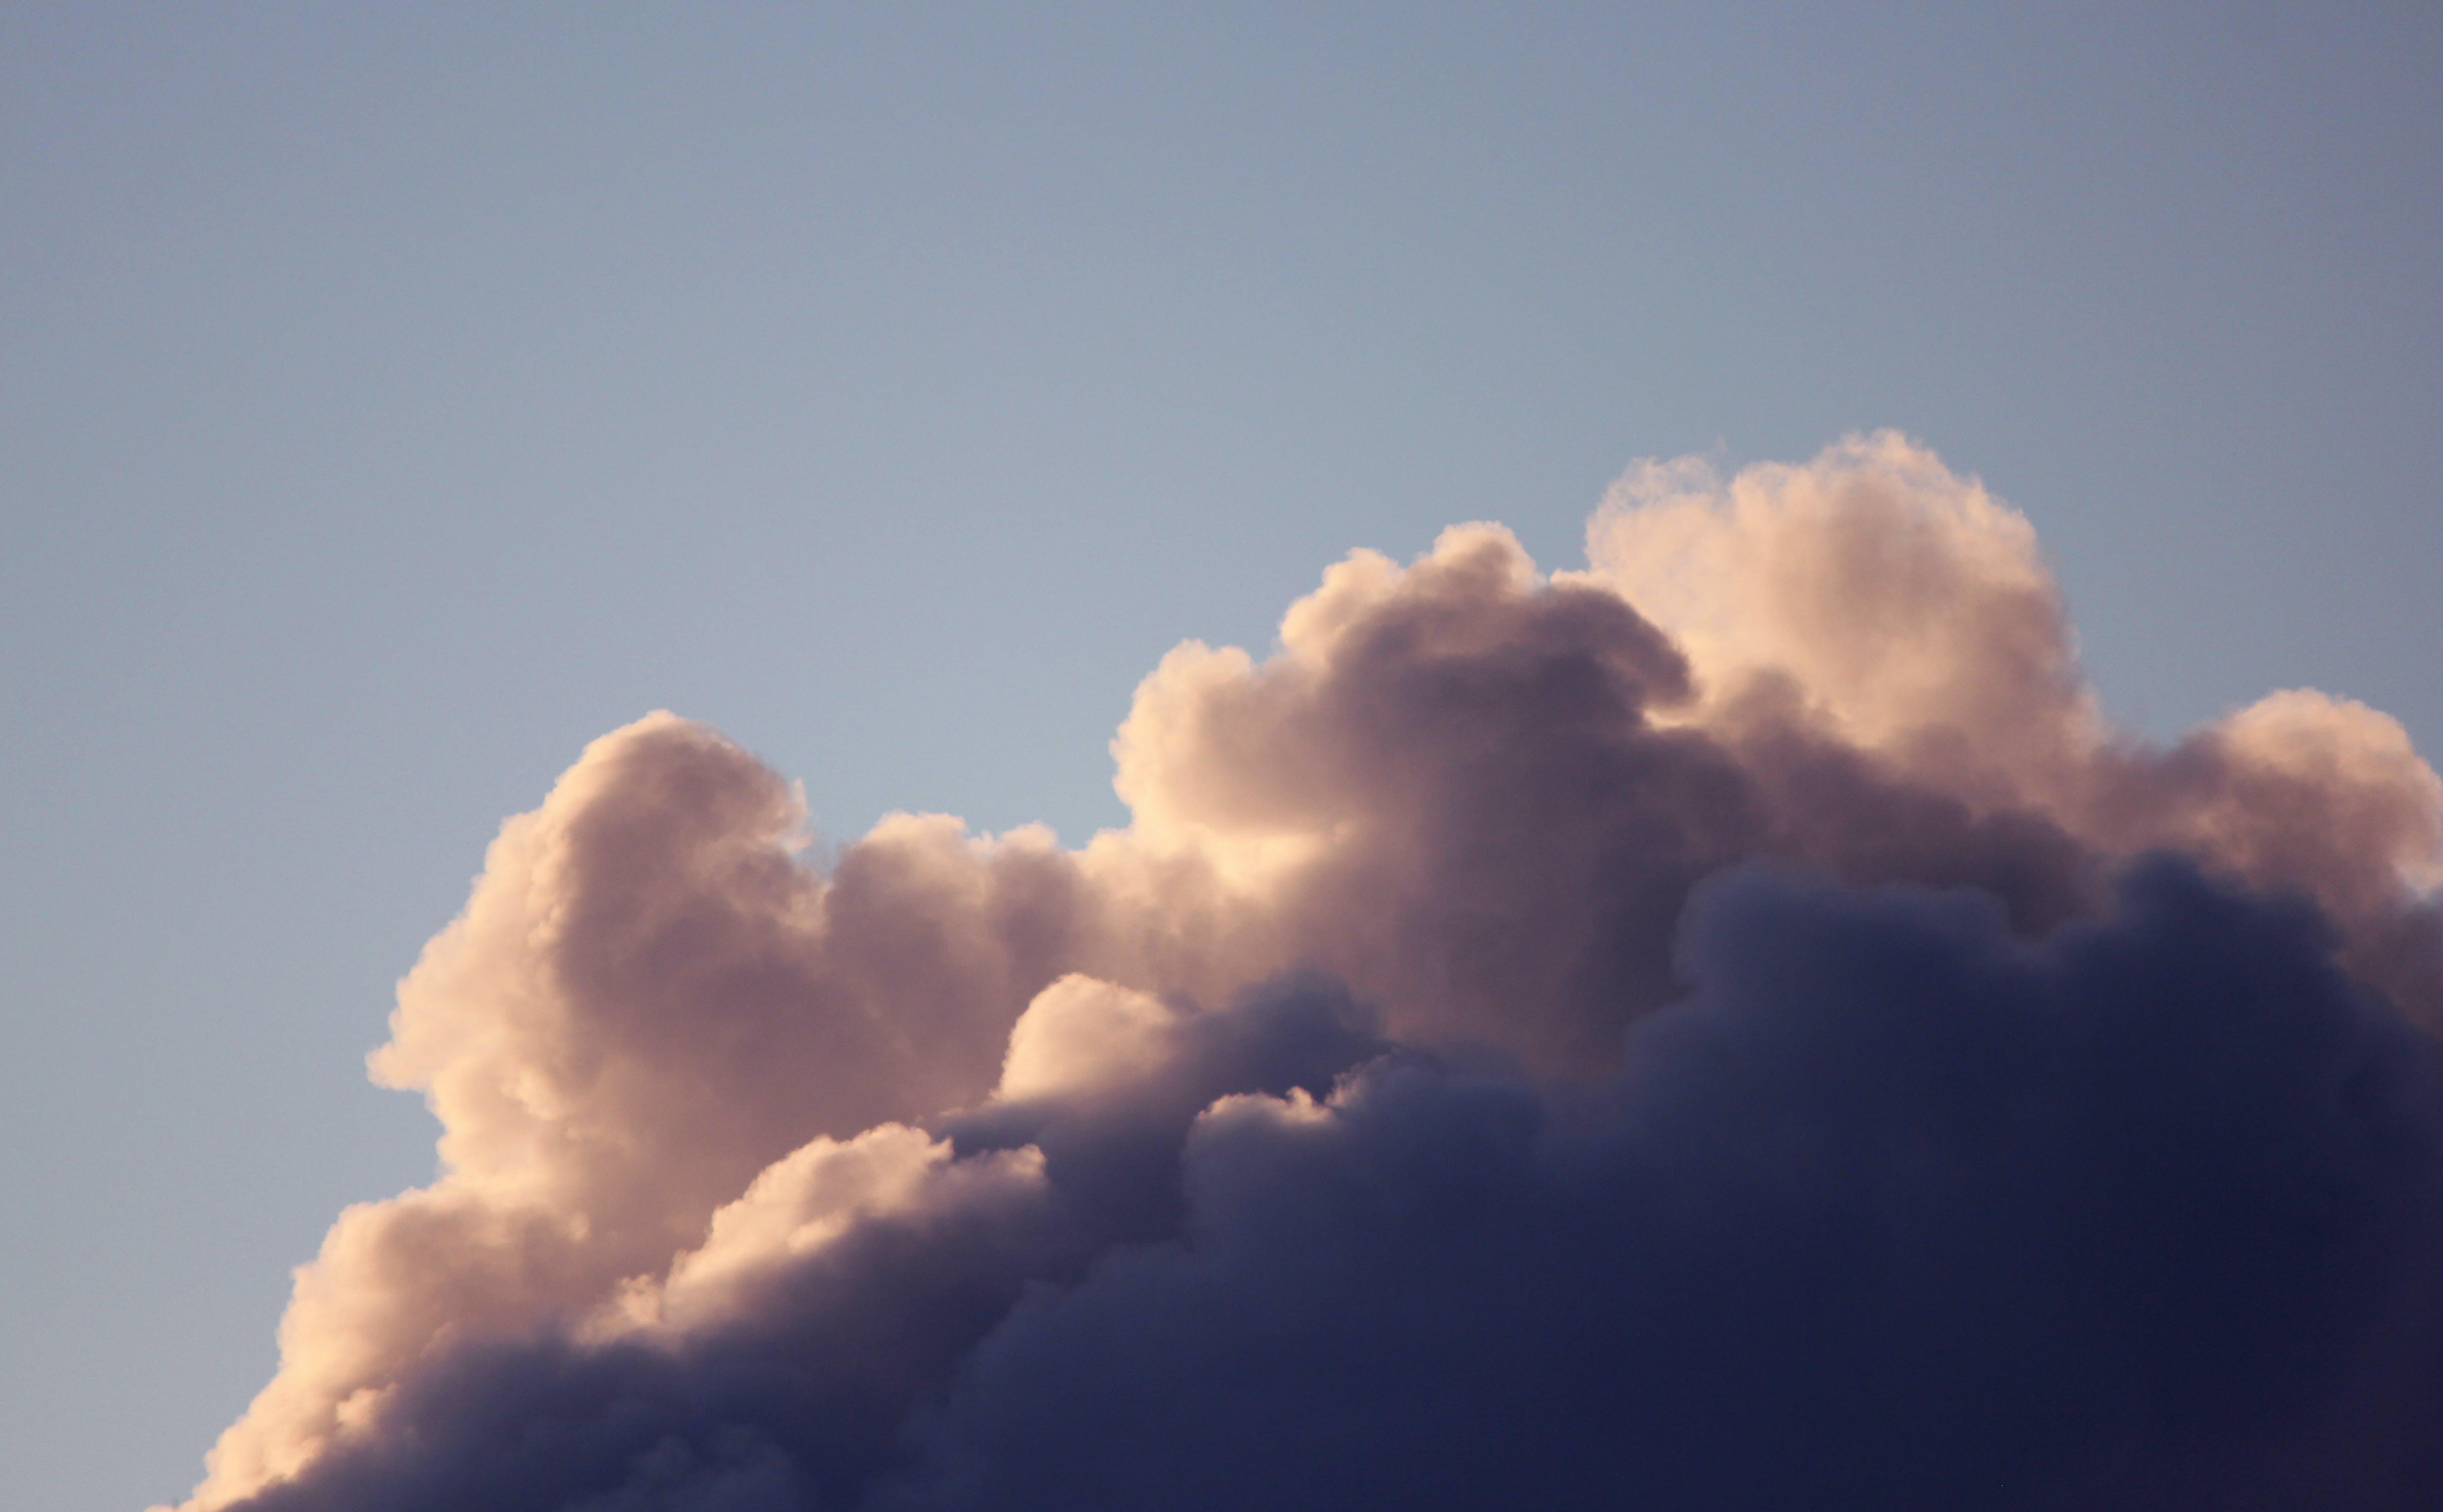 Free stock photo of clouds, blue sky, cumulus